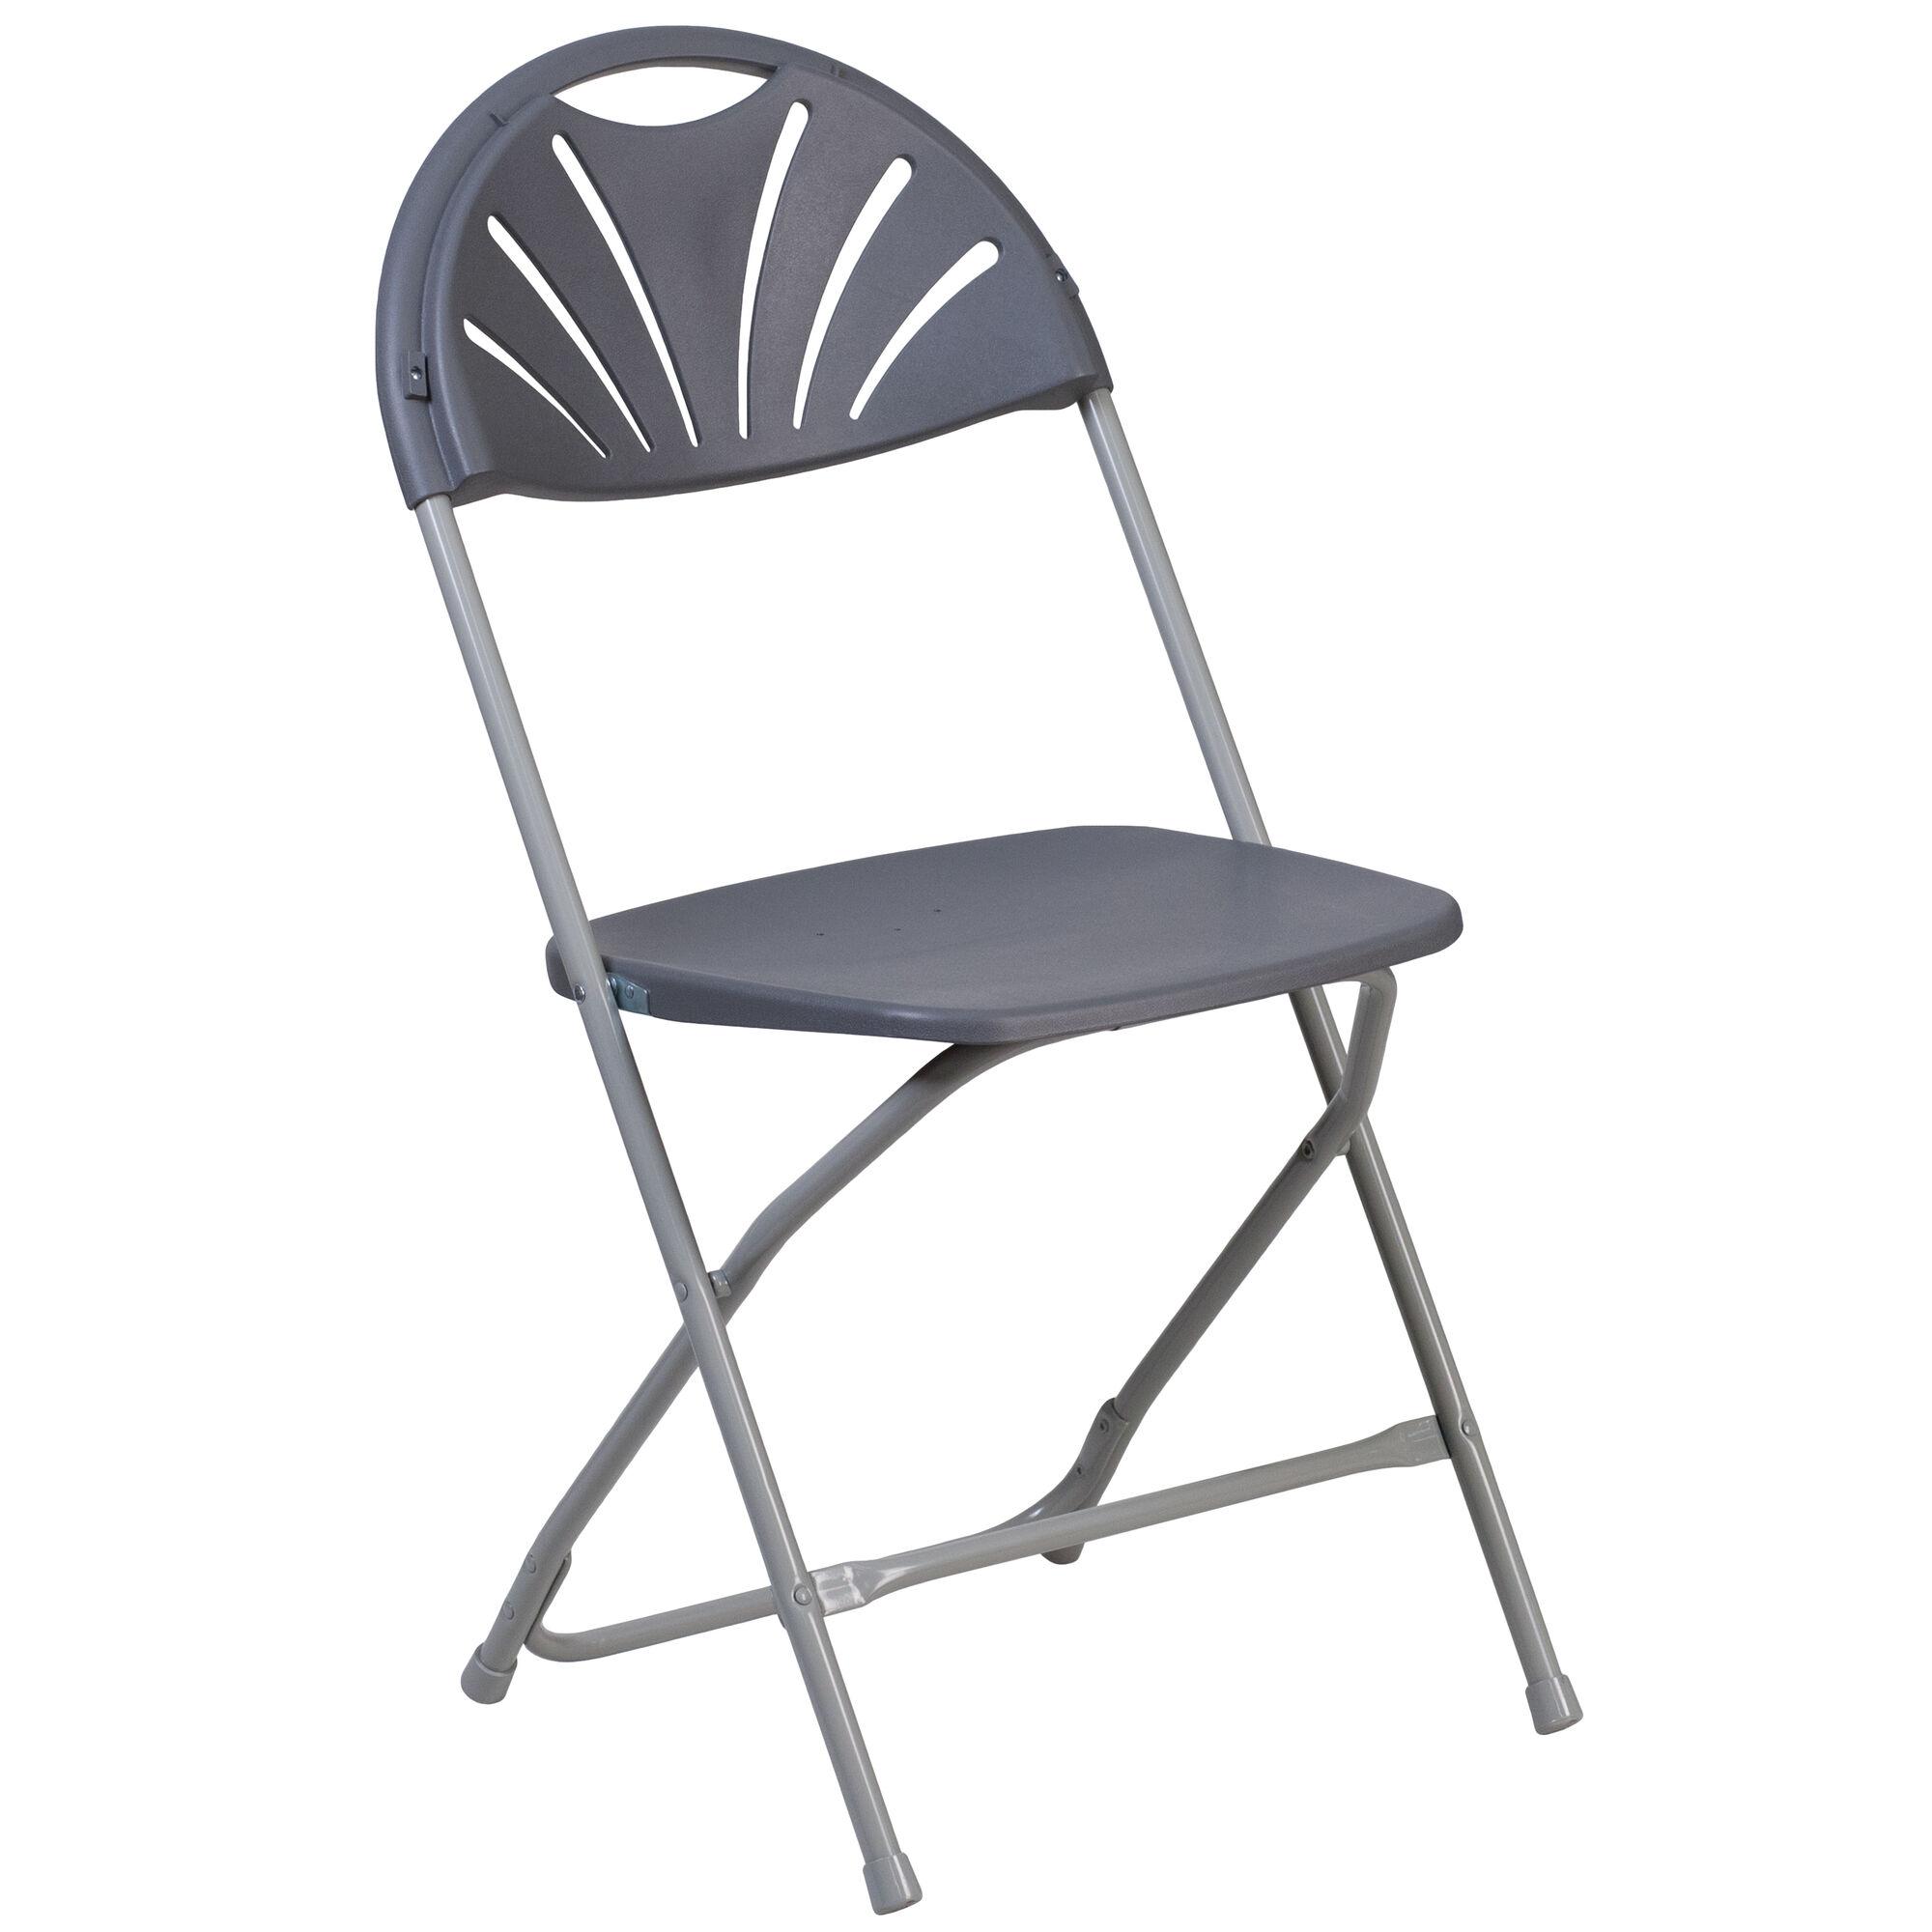 FoldingChairs4Less Fan Back Folding Chairs